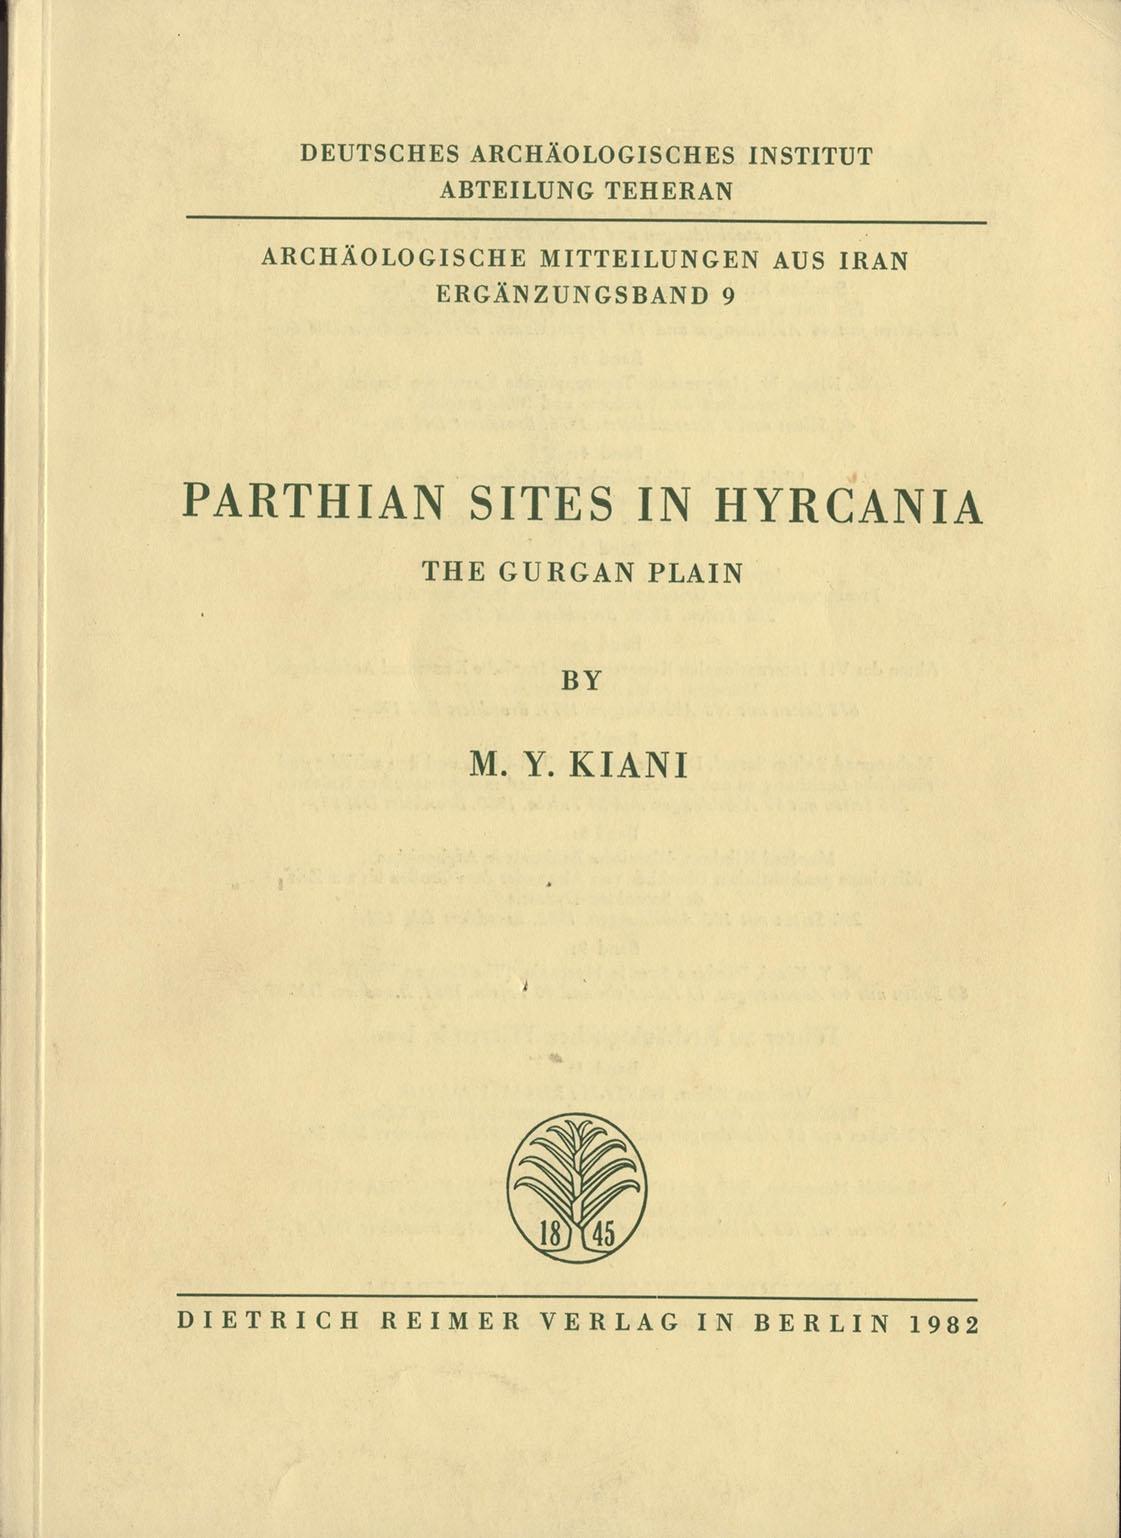 PARTHIAN SITES IN HYRCANIA THE GURGAN PLAIN